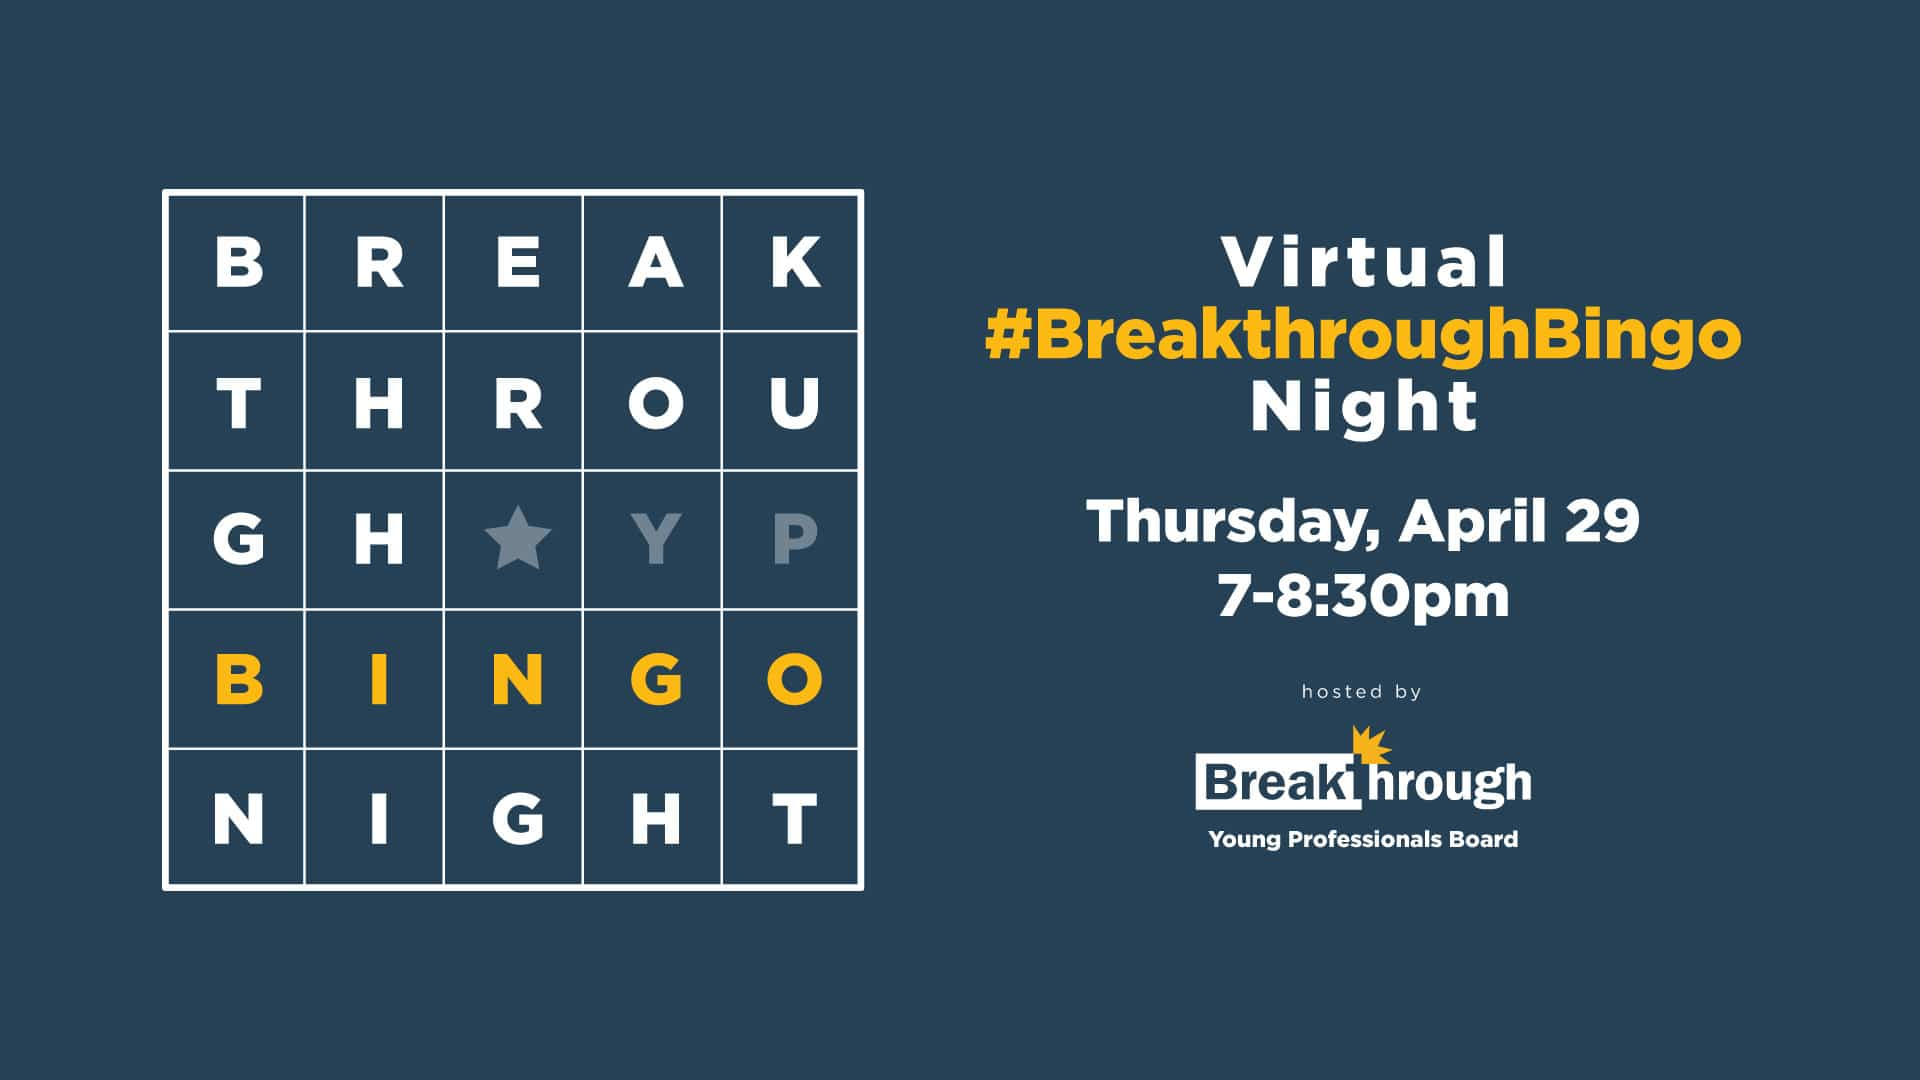 Virtual #BreakthroughBingo Night 4